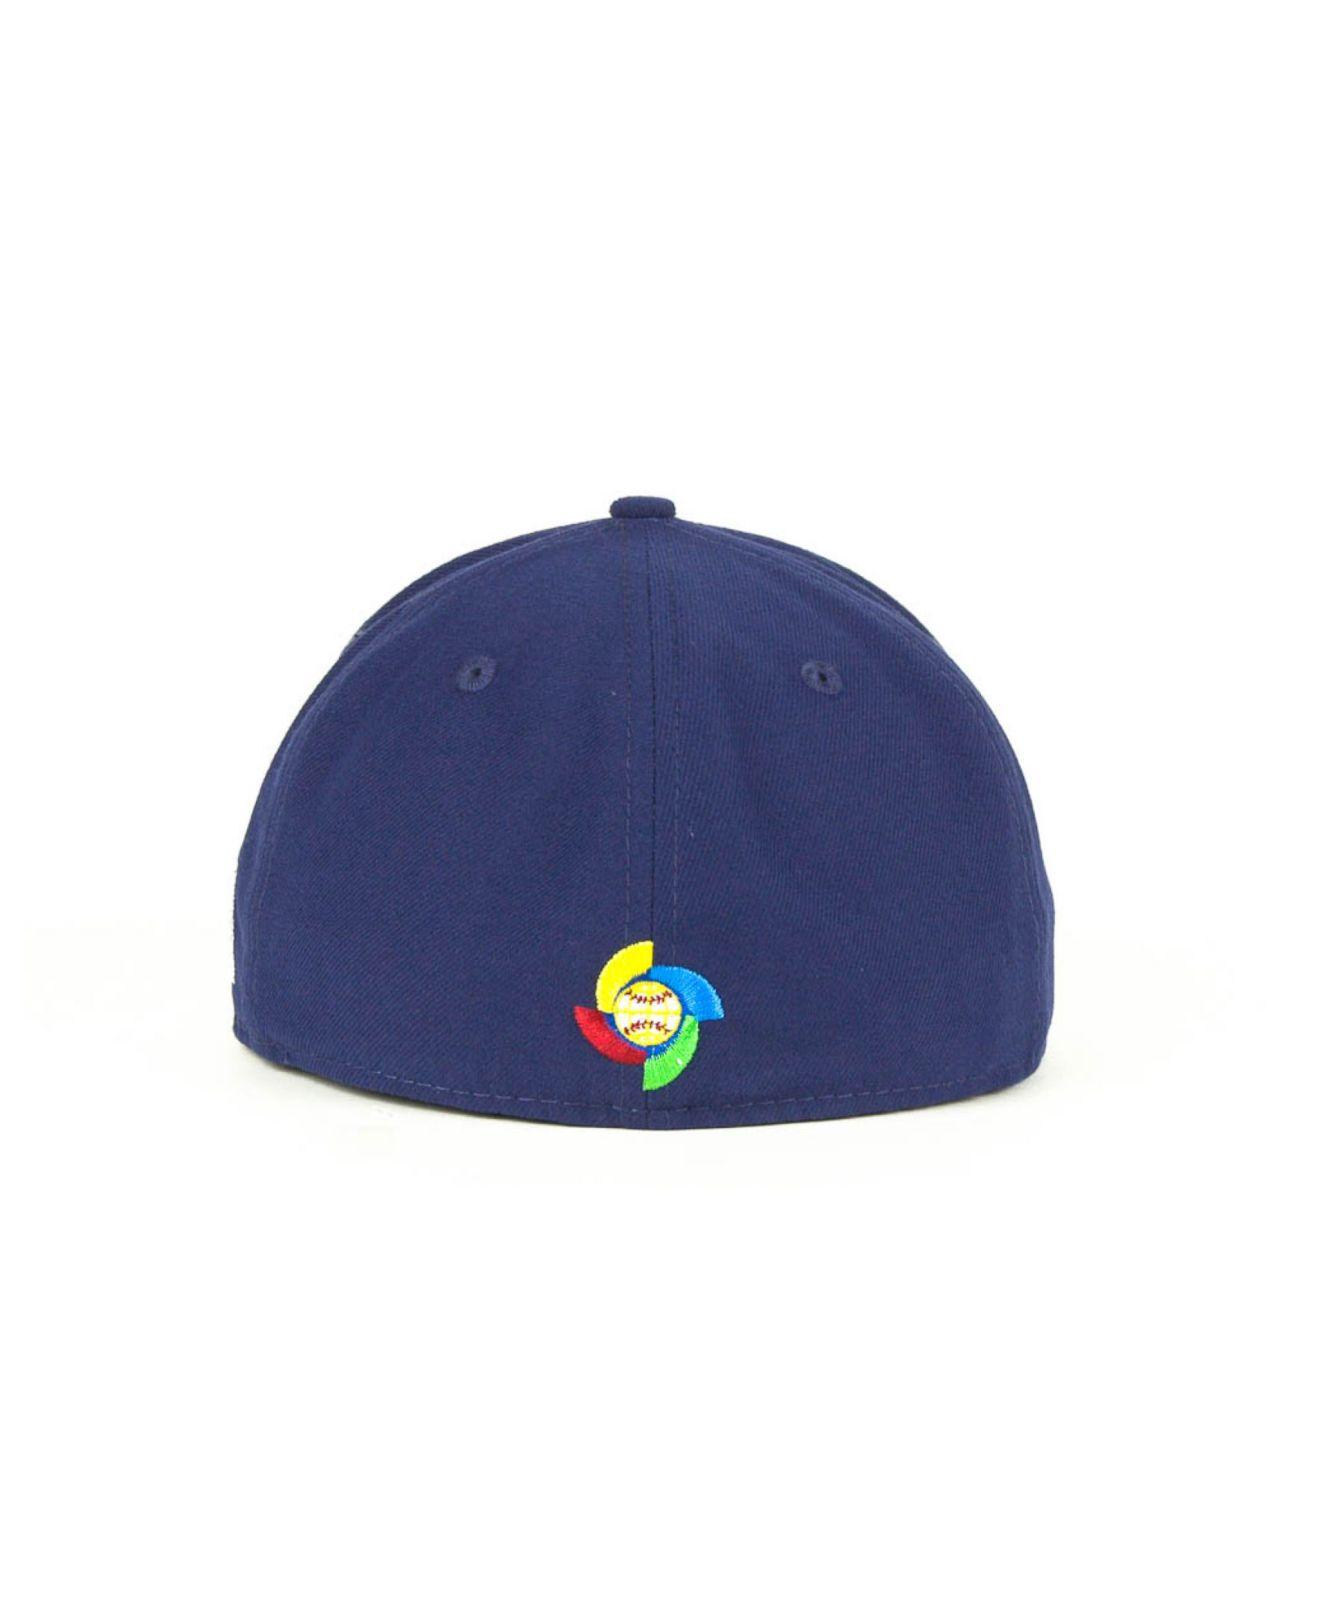 ktz usa 2013 world baseball classic 59fifty cap in blue